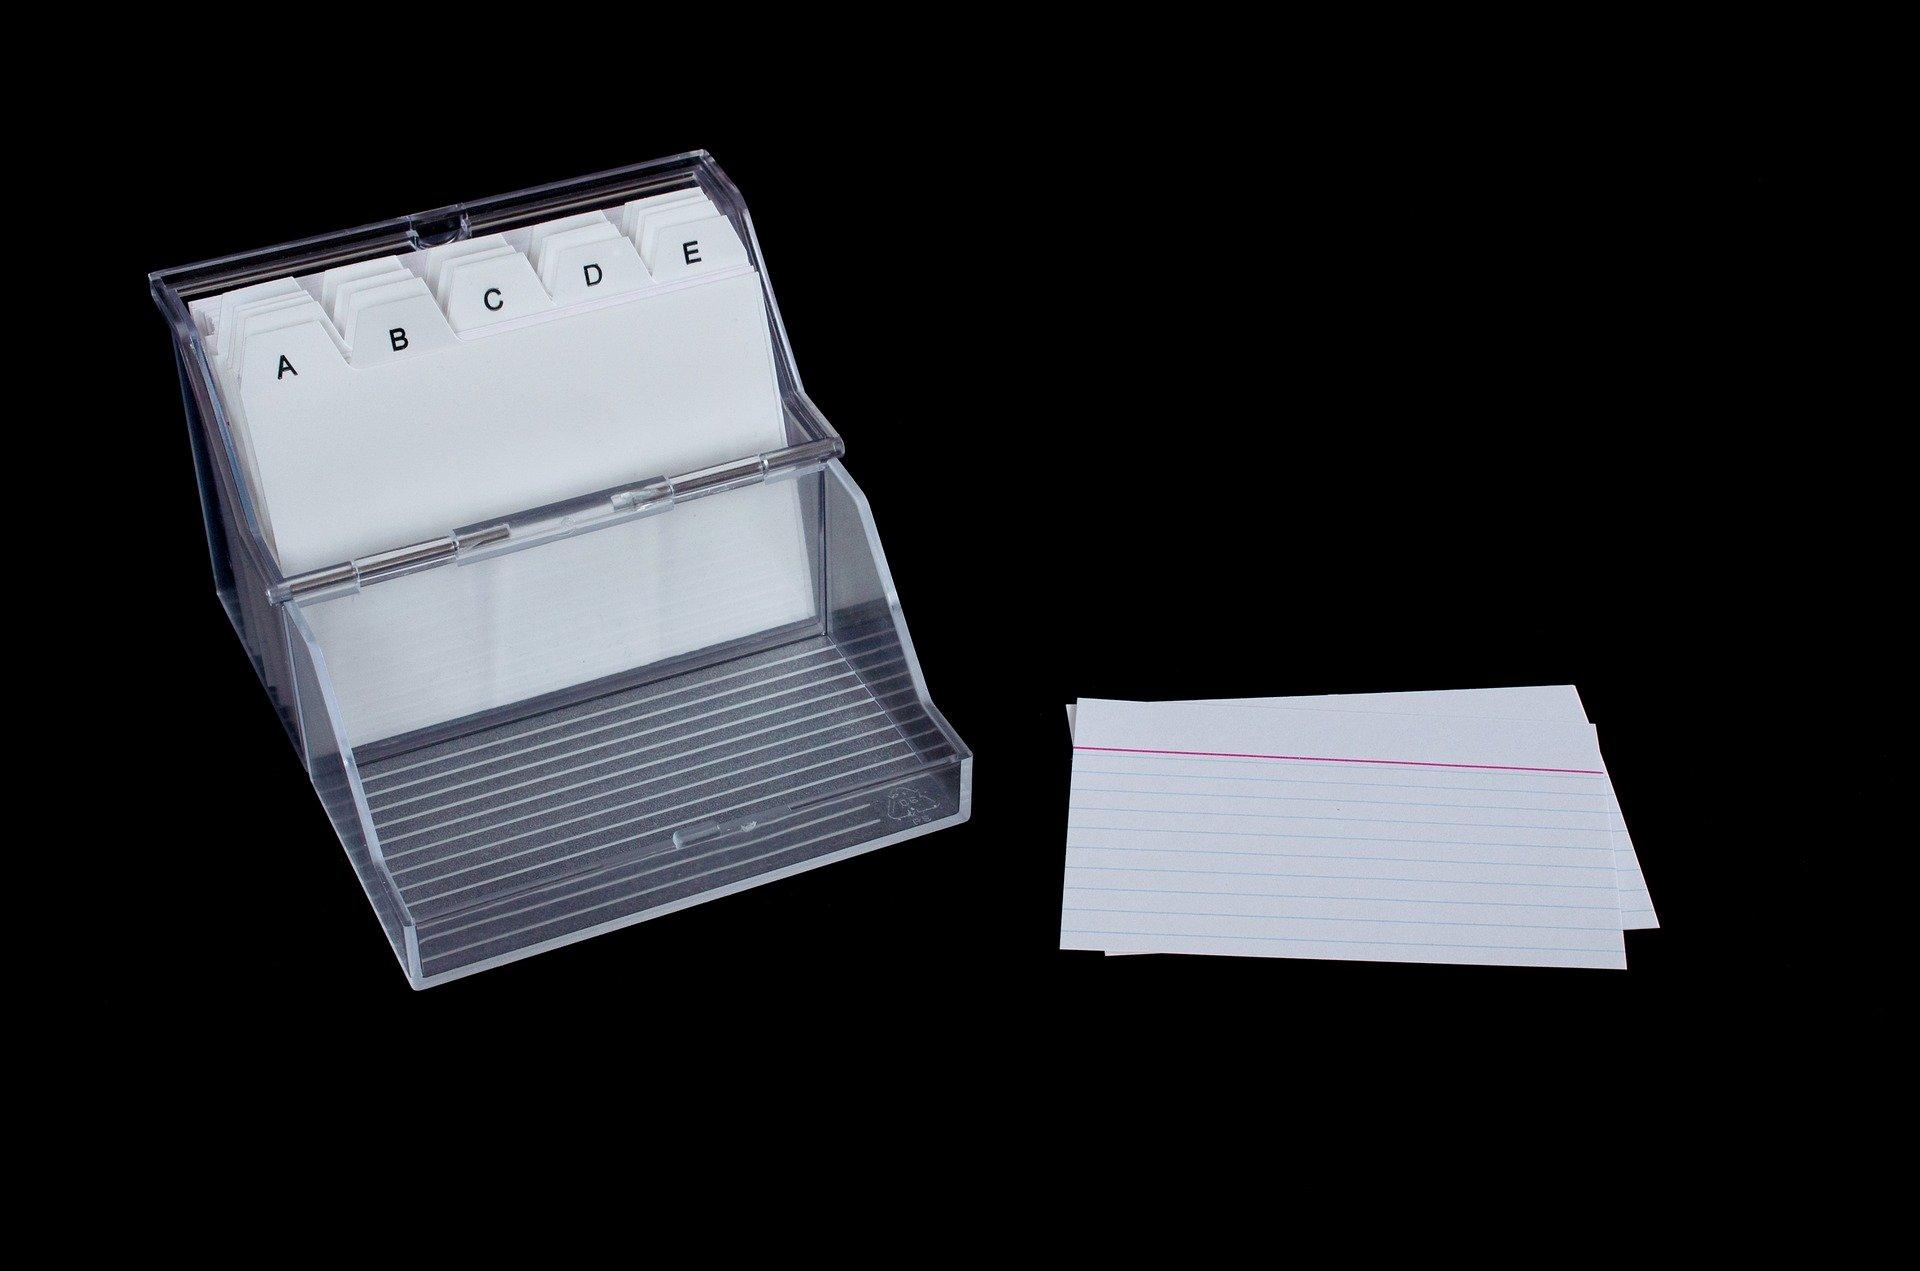 index-card-box-2288588_1920